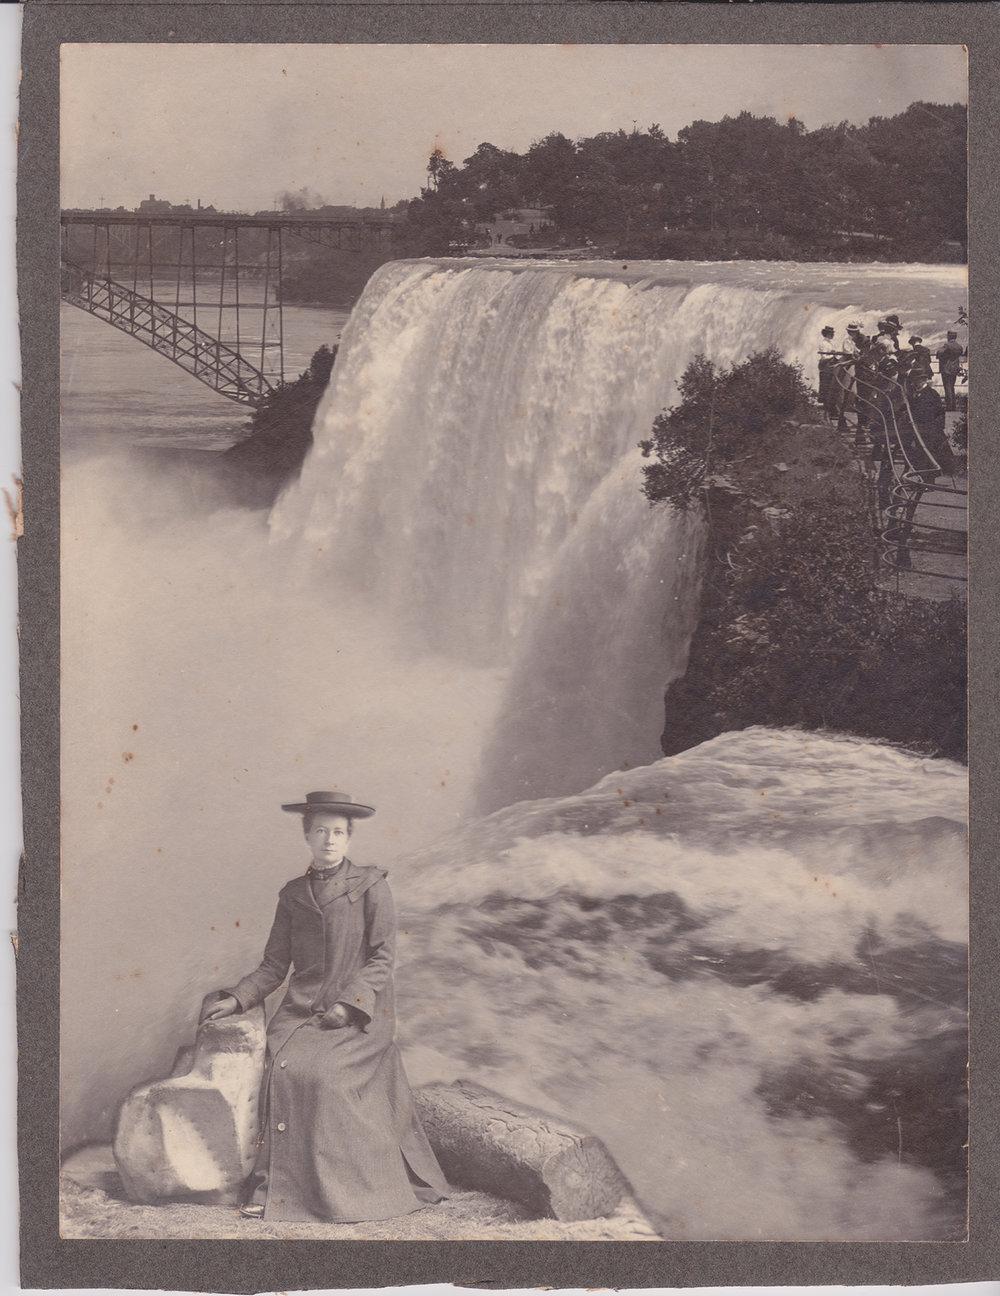 Bessie Niagara Falls small.jpg